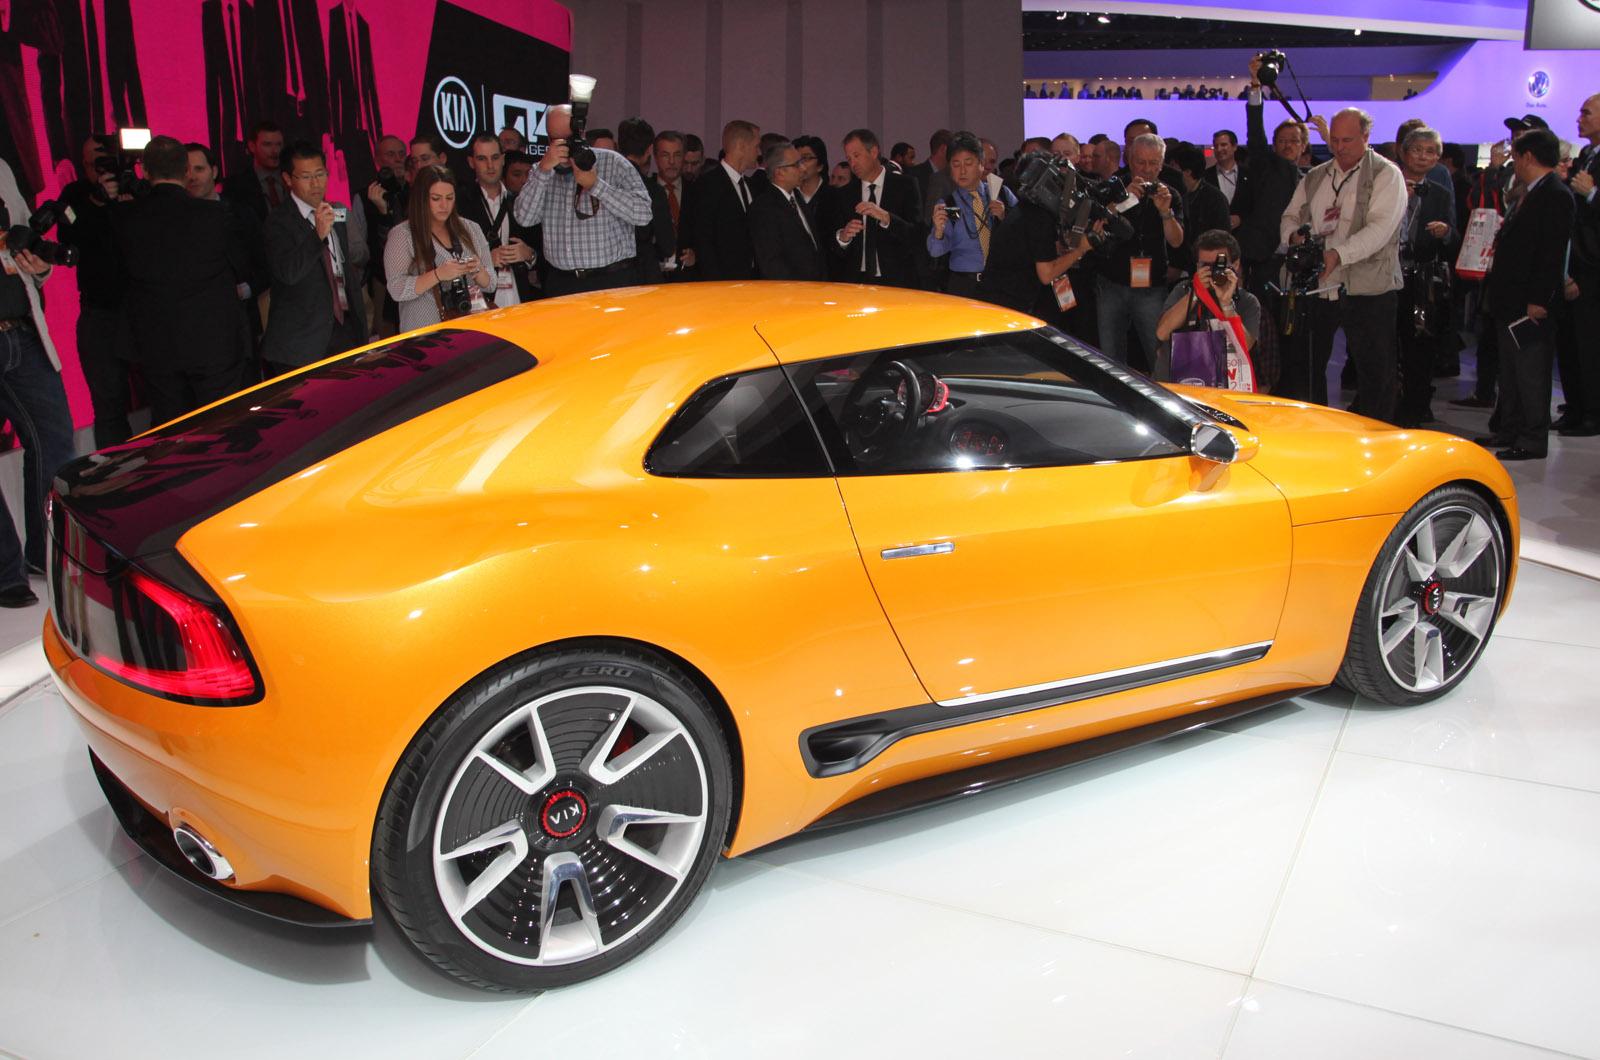 kia plans new gt sports car for 2016 autocar. Black Bedroom Furniture Sets. Home Design Ideas